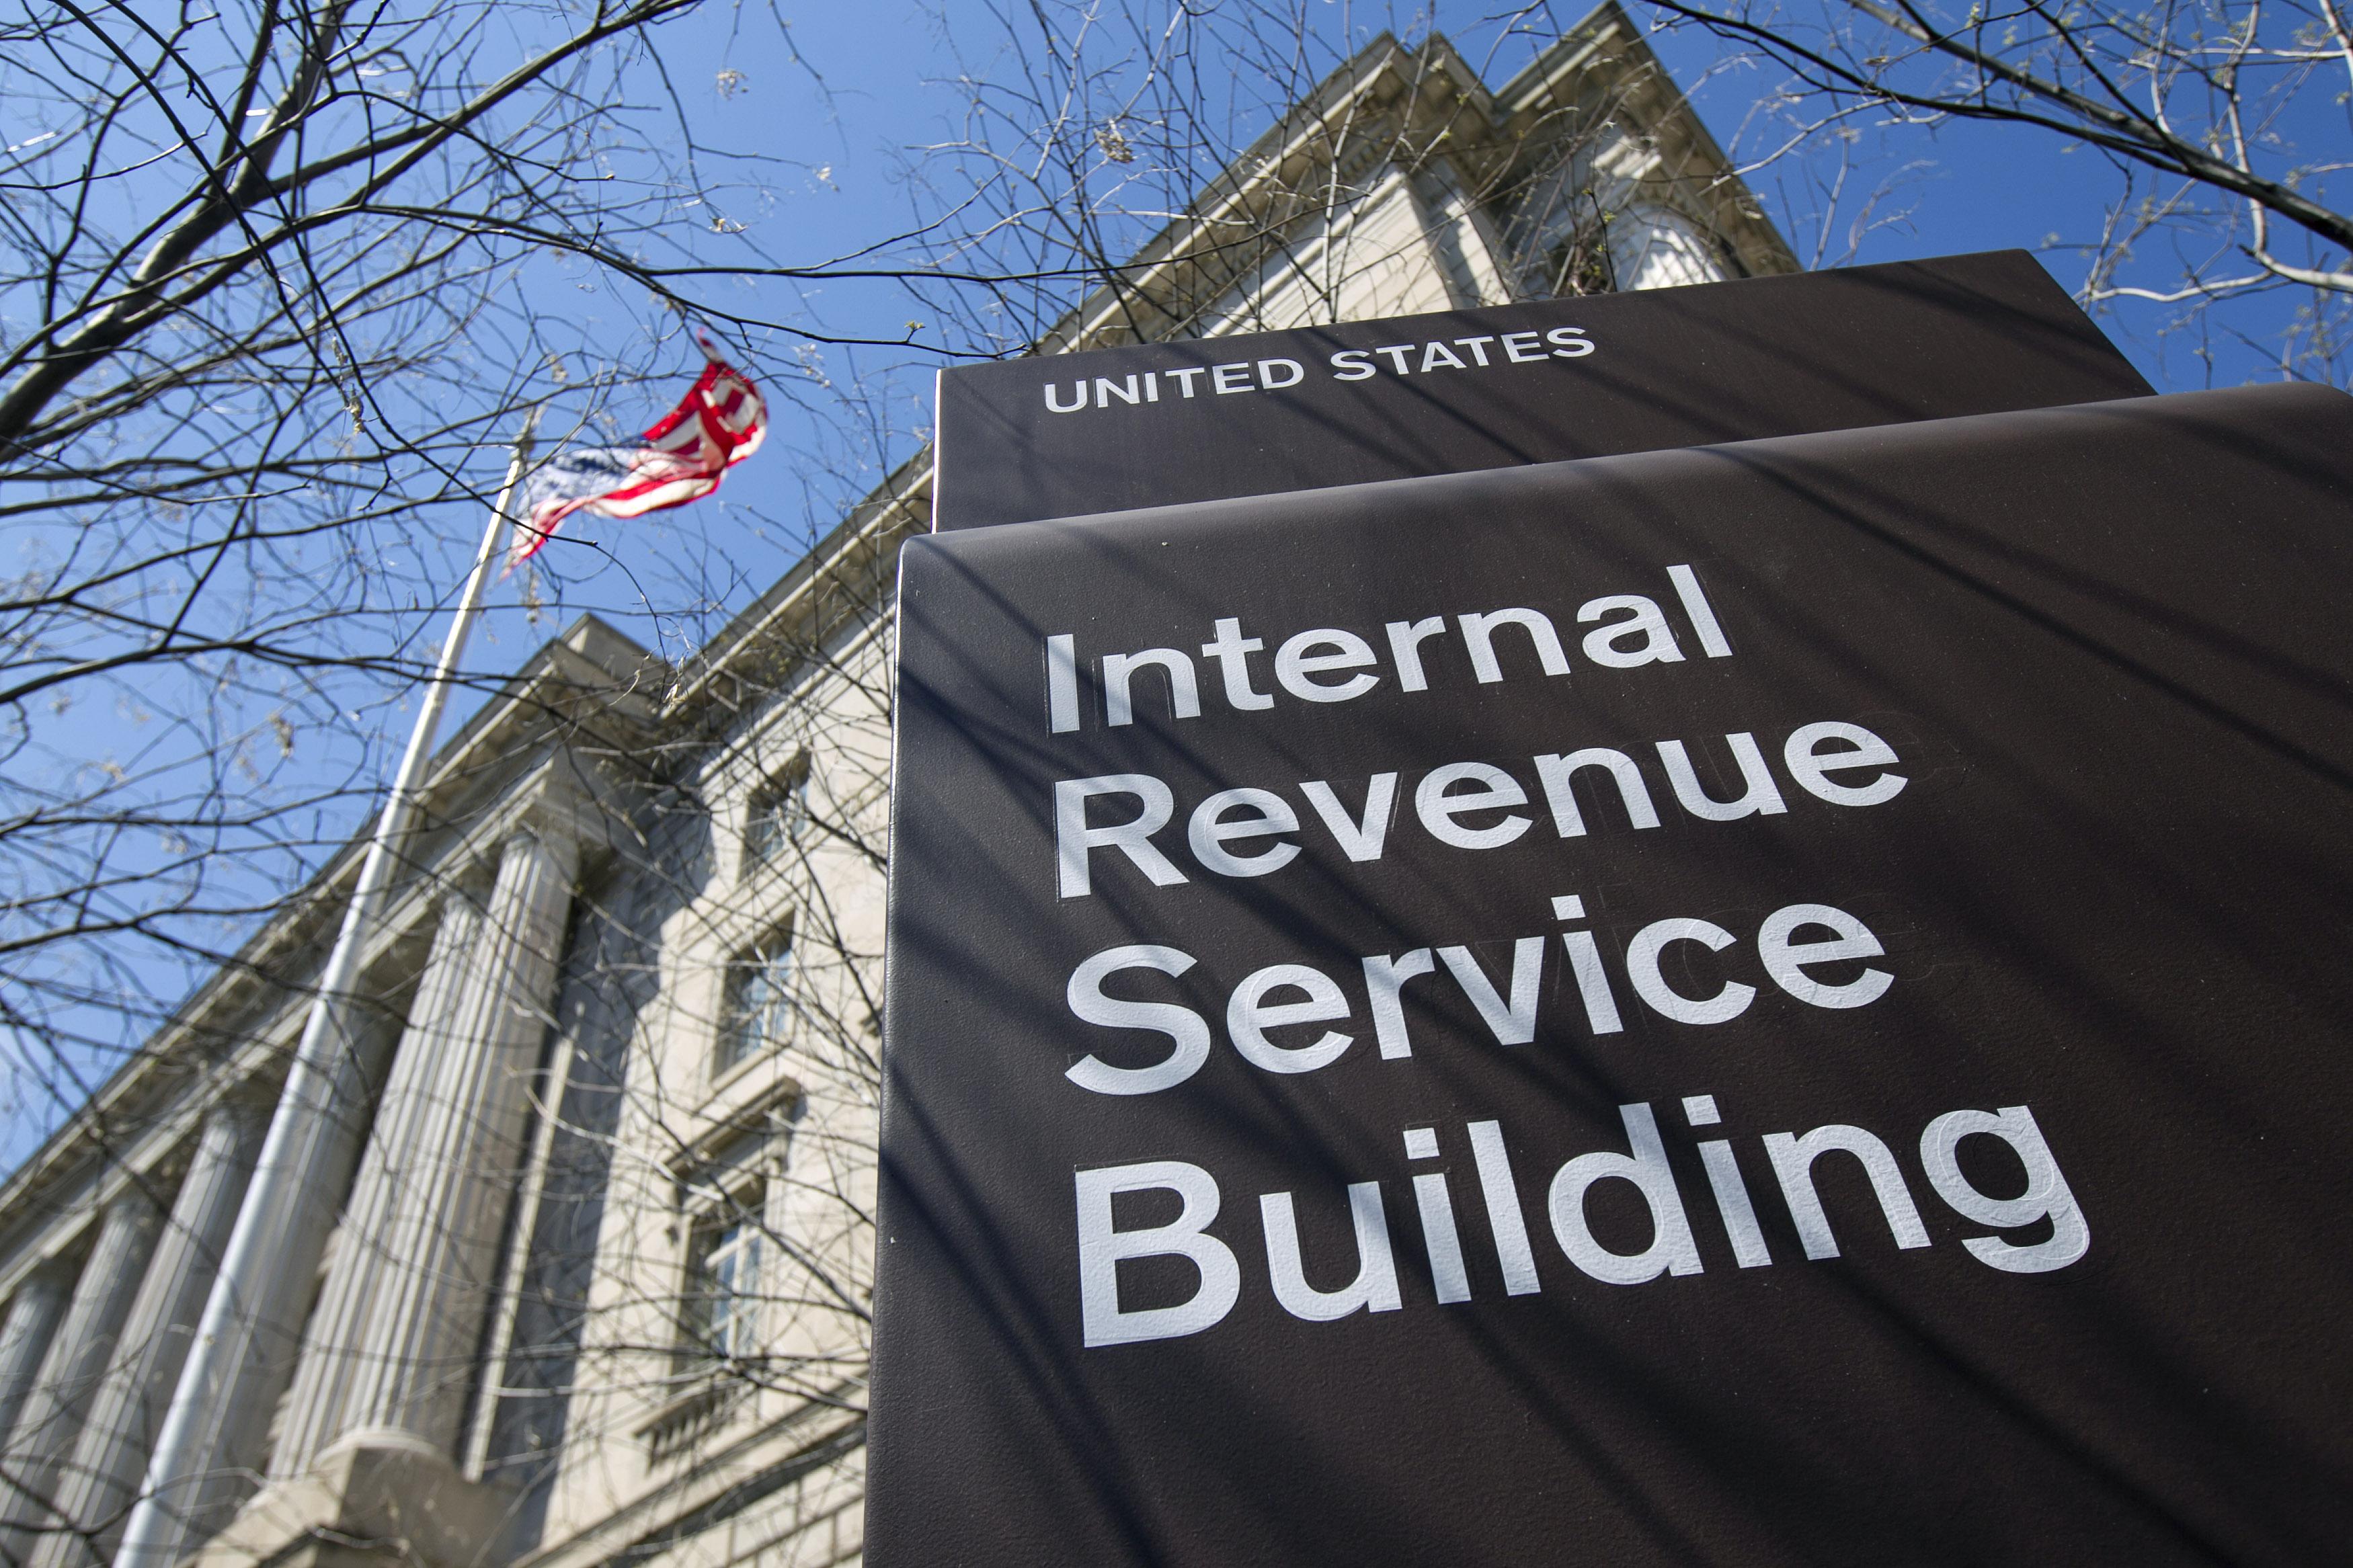 IRS Building - CompanyMileage